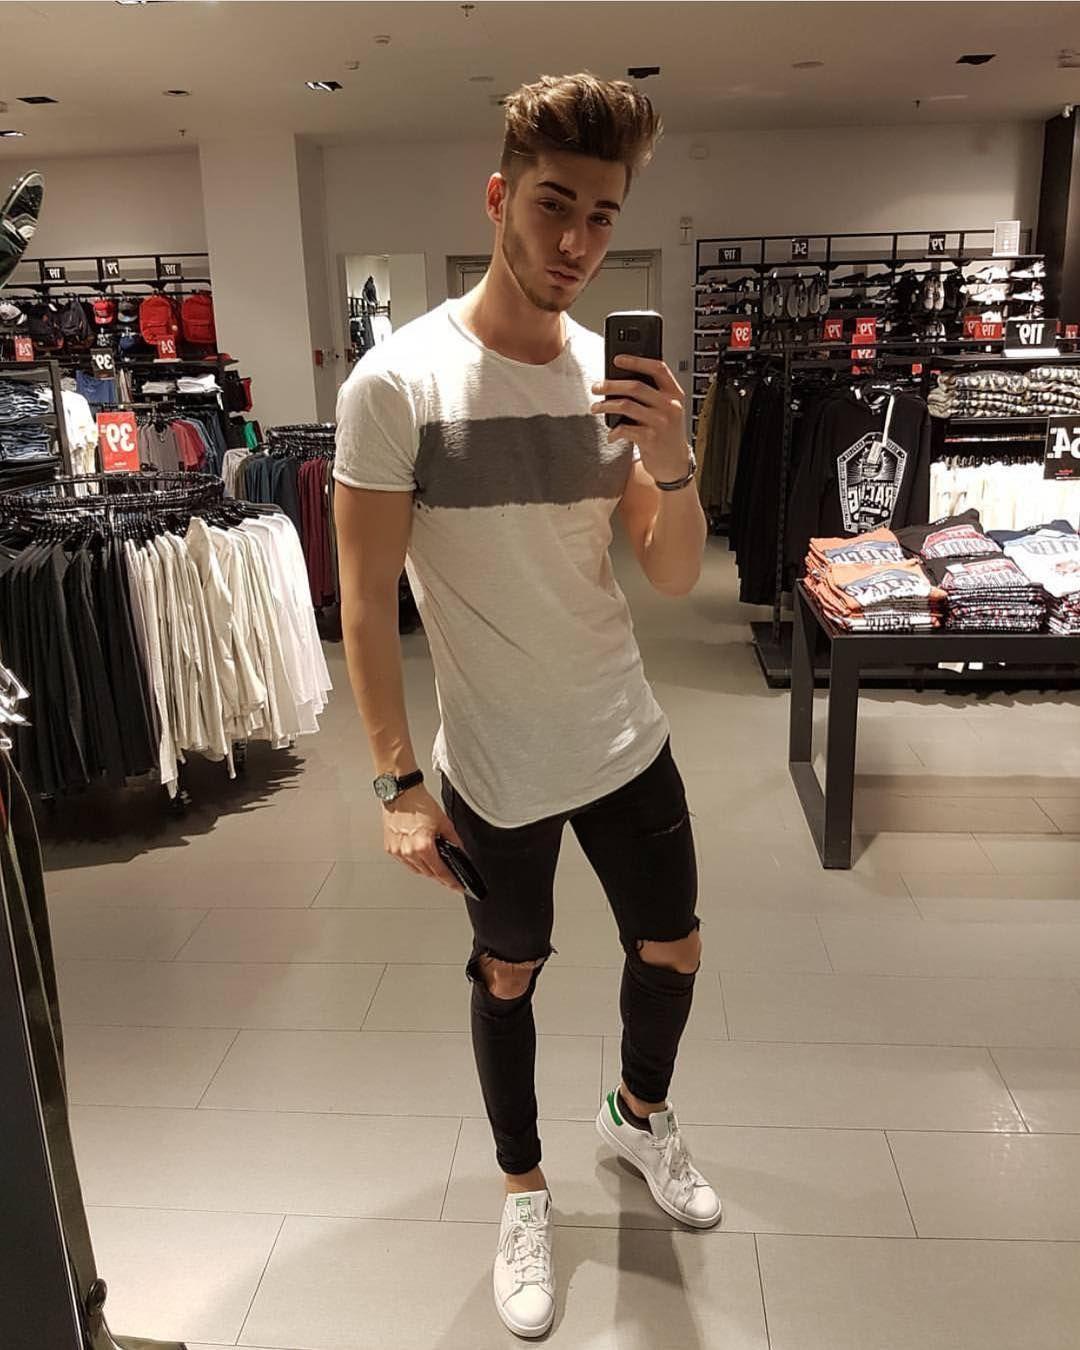 Camiseta + calça jeans preta rasgada + tênis Adidas Stan Smith - via Avant  Style ( avantstyle) on Instagram c25285a9ac509